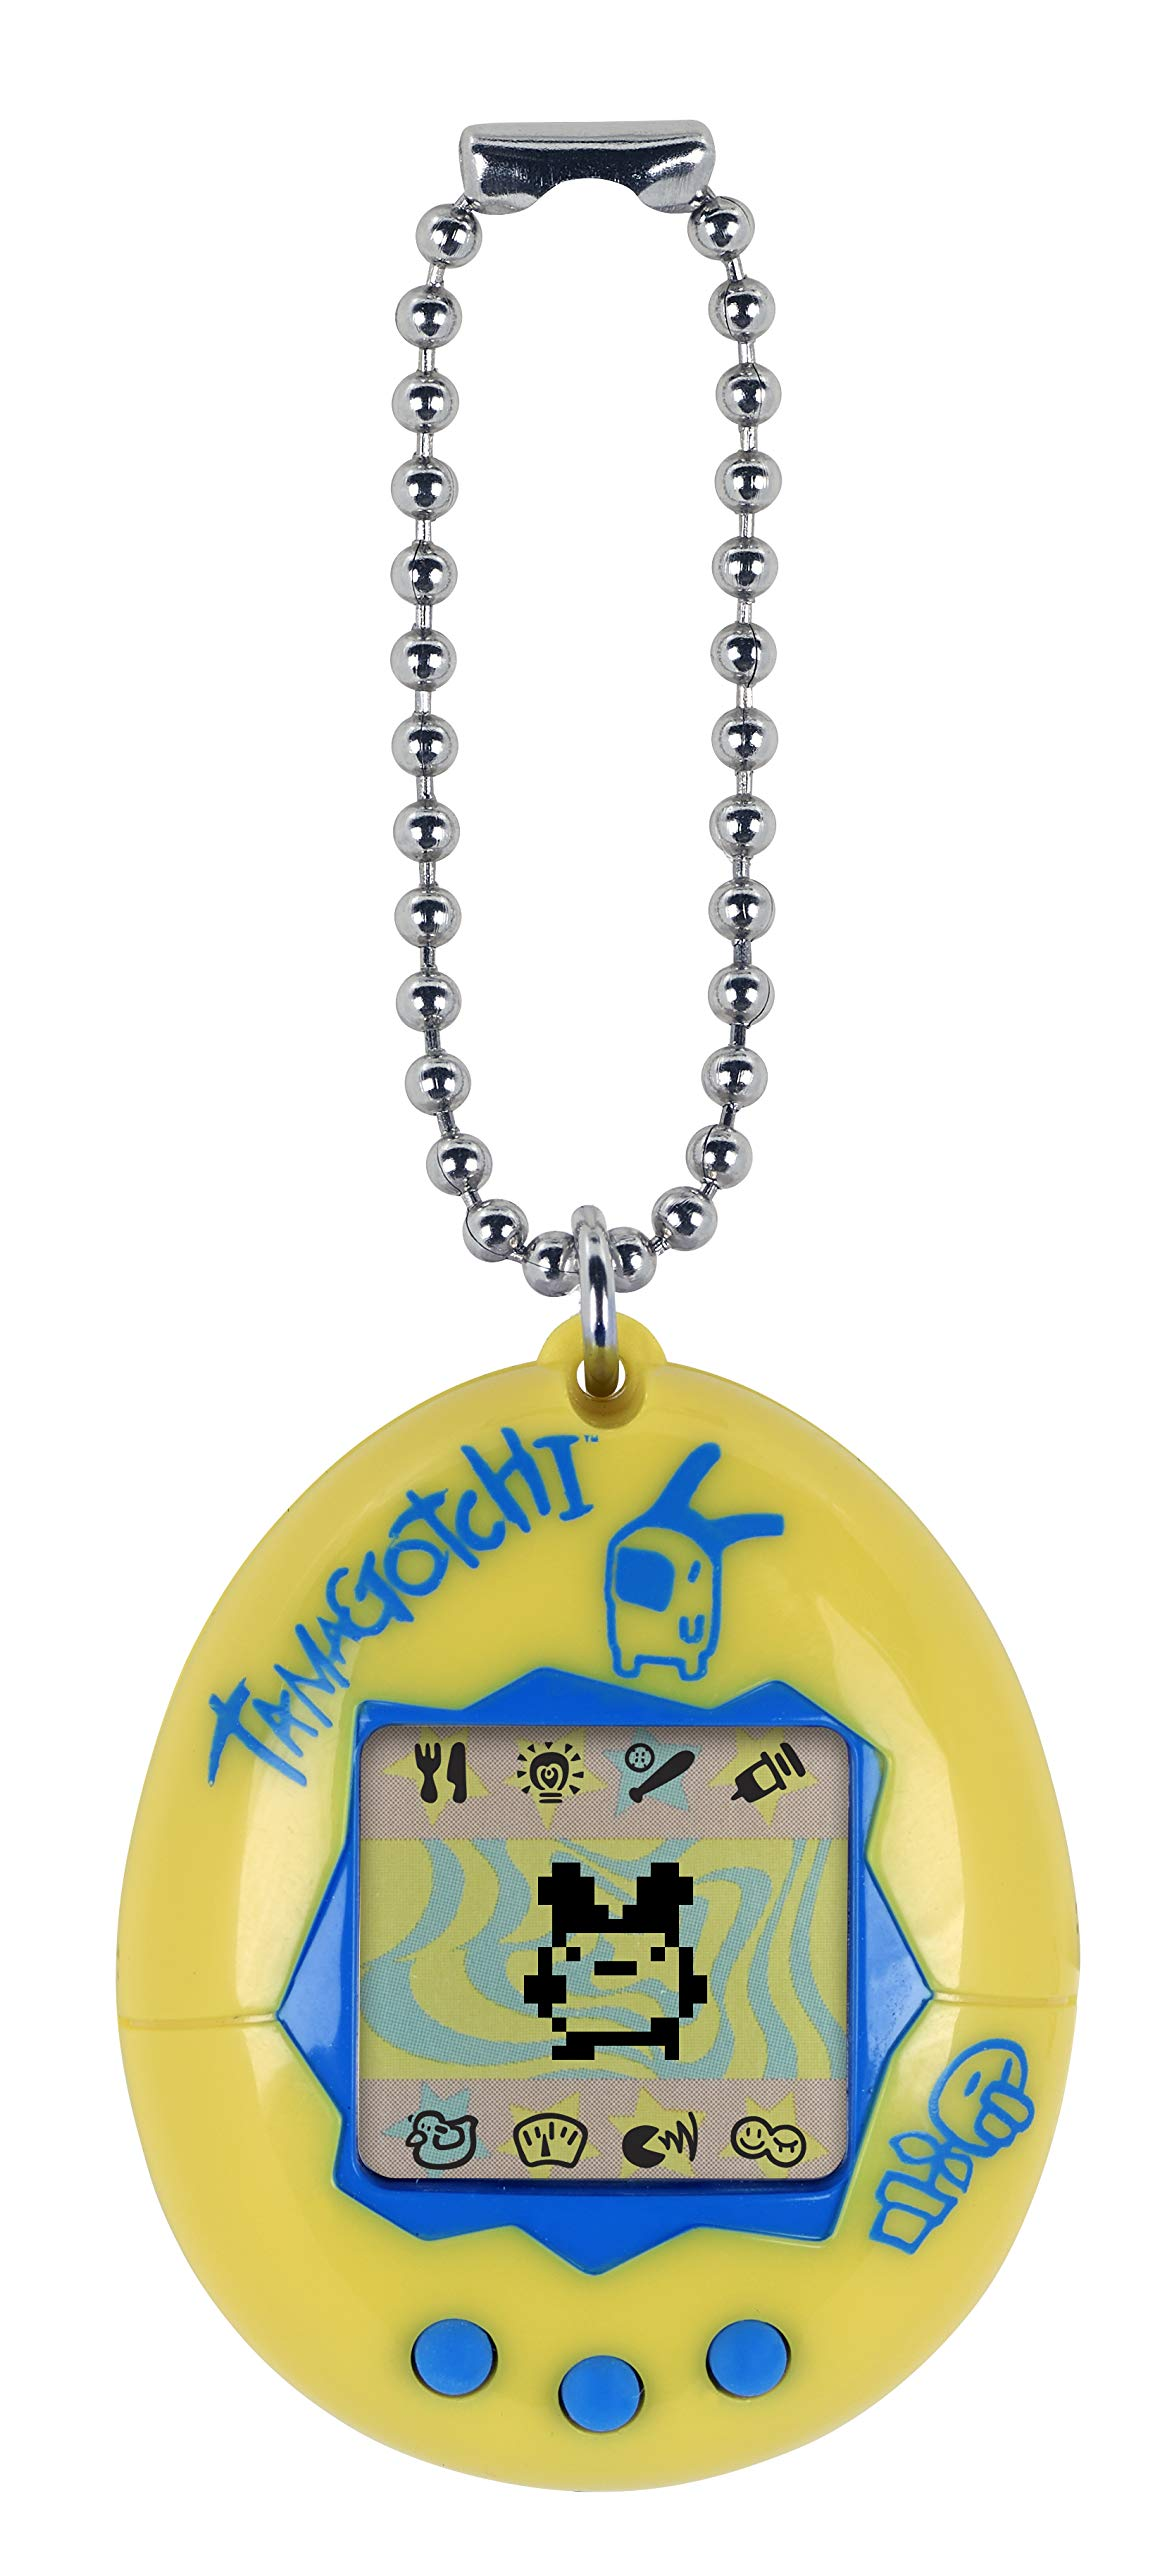 Tamagotchi Electronic Game, Yellow/Blue by Tamagotchi (Image #1)